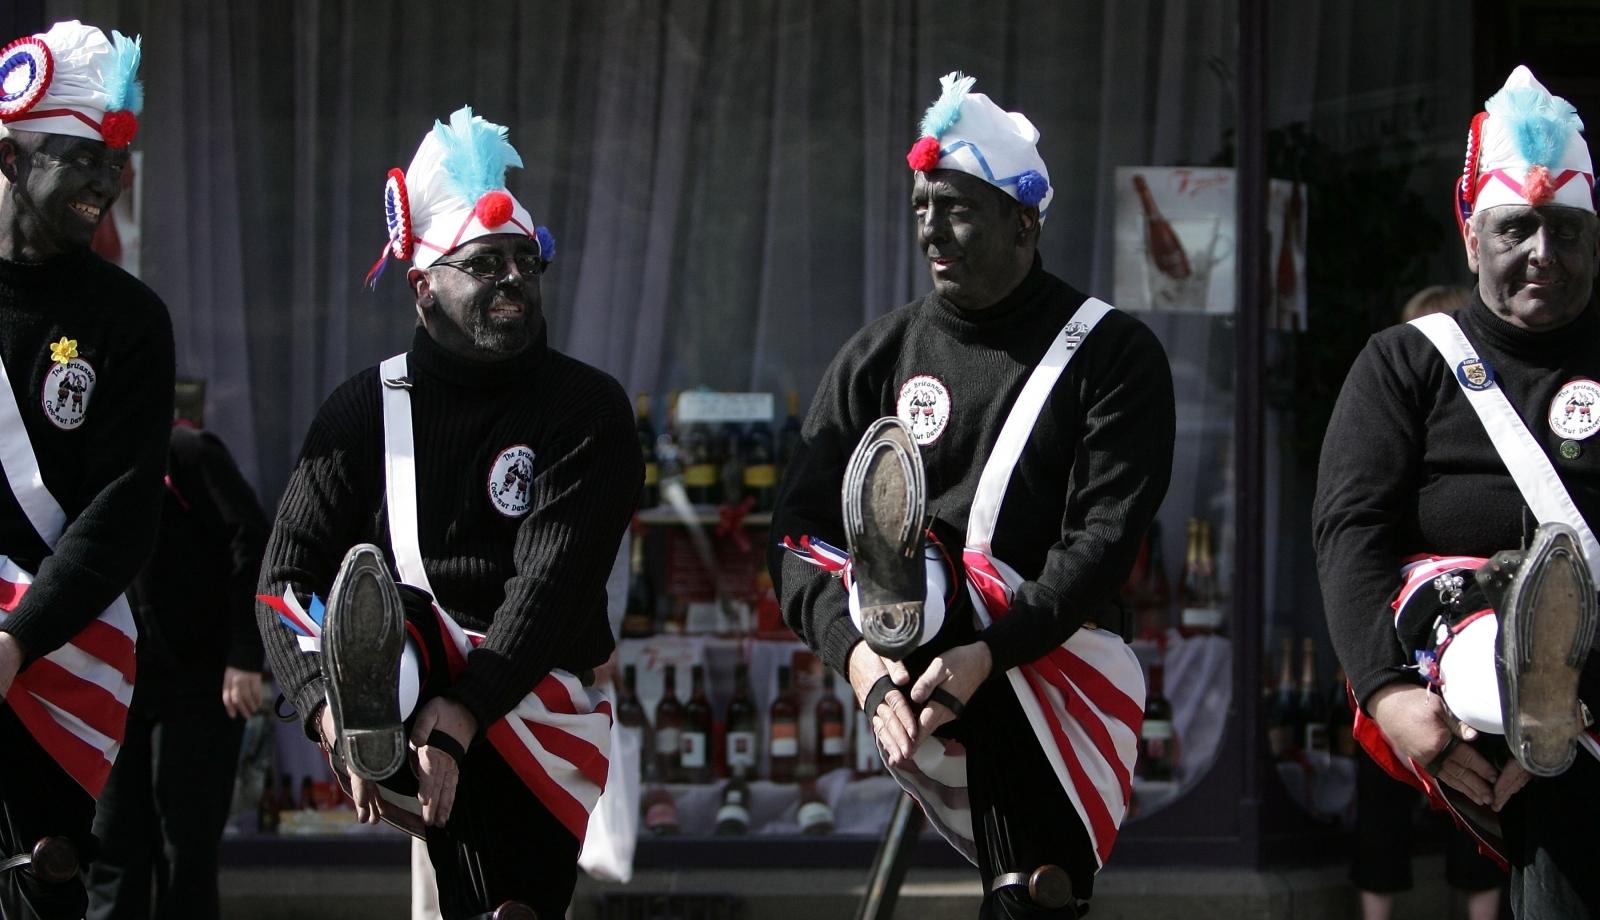 The black faced Morrismen of the Britannia Coconutters